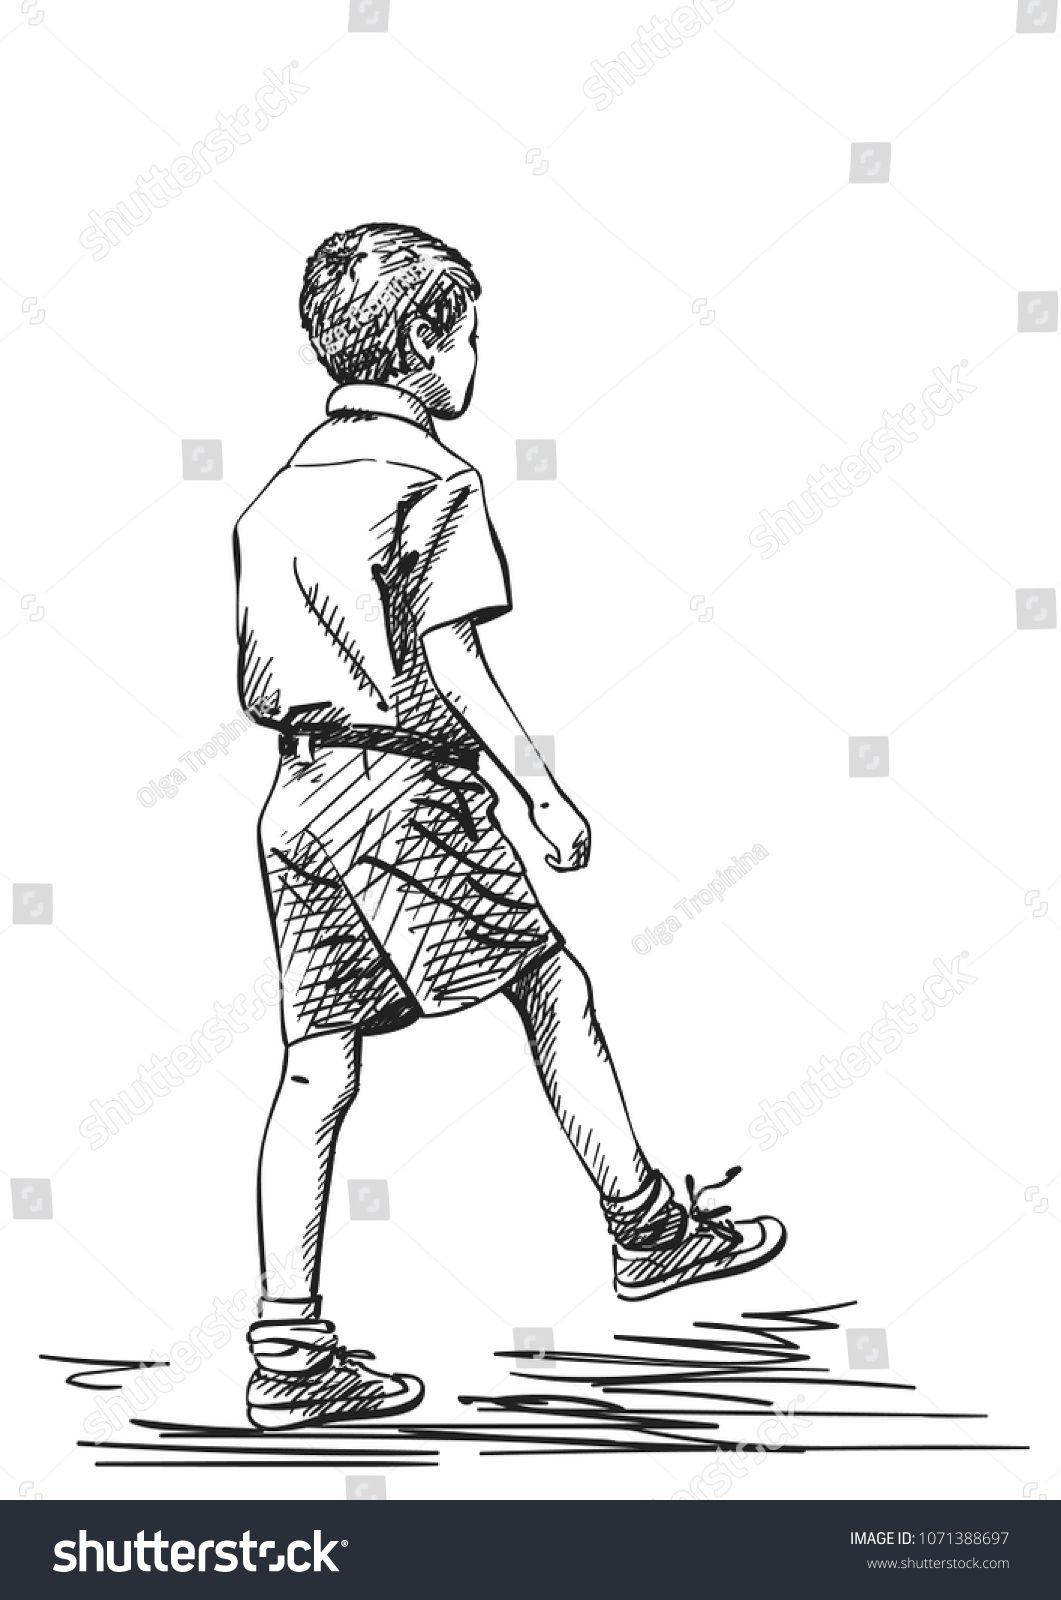 Vector sketch of indian boy in school uniform takes a step